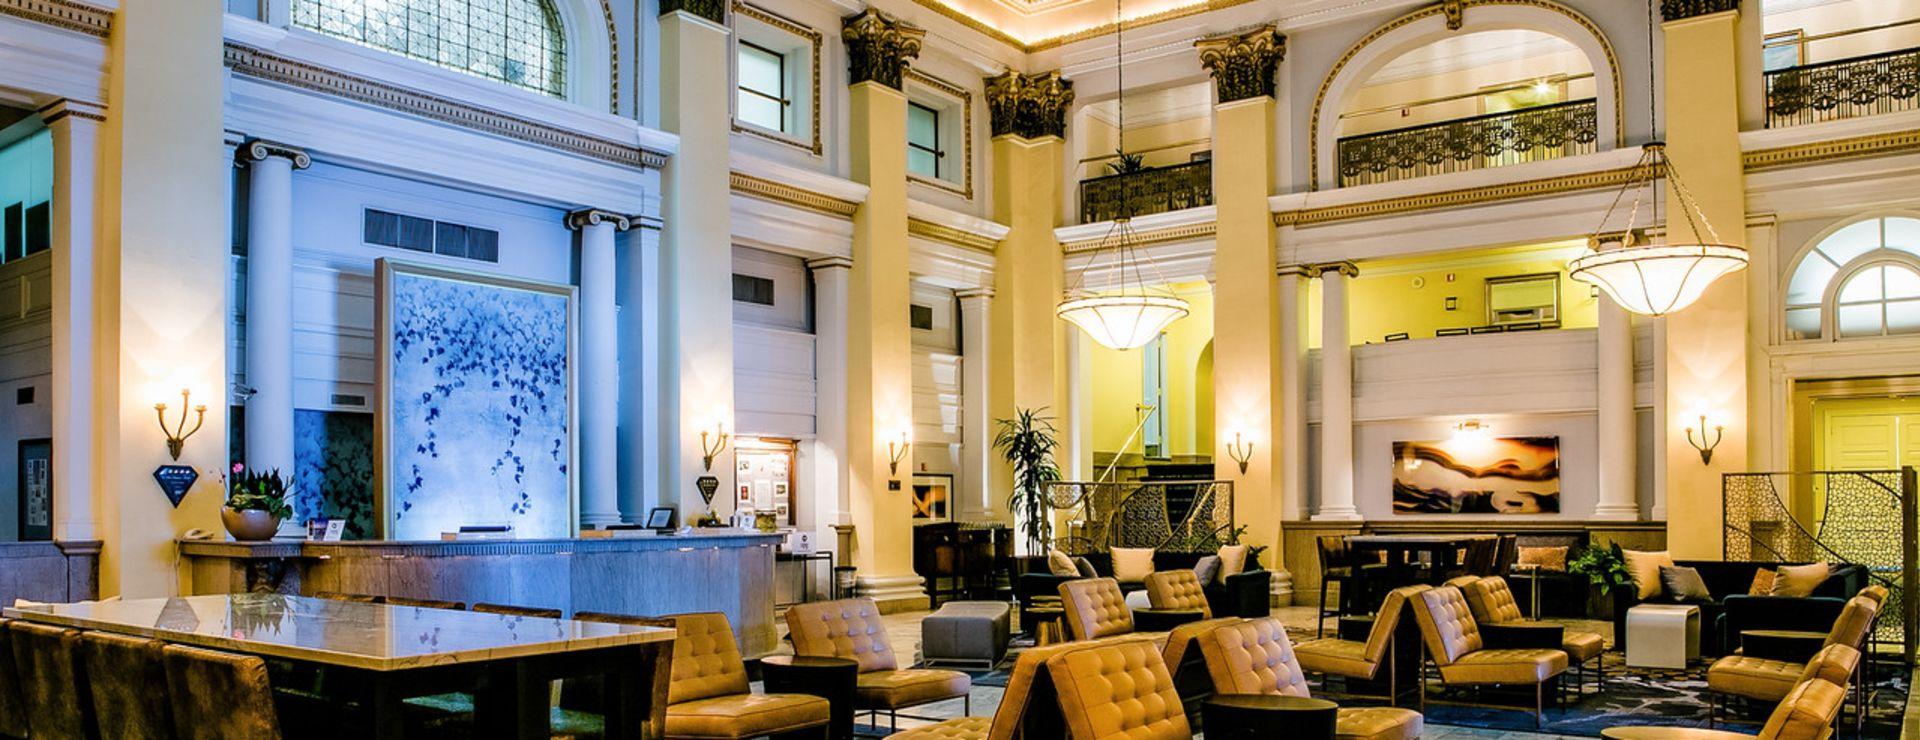 The Westin Columbus Hotel Lobby